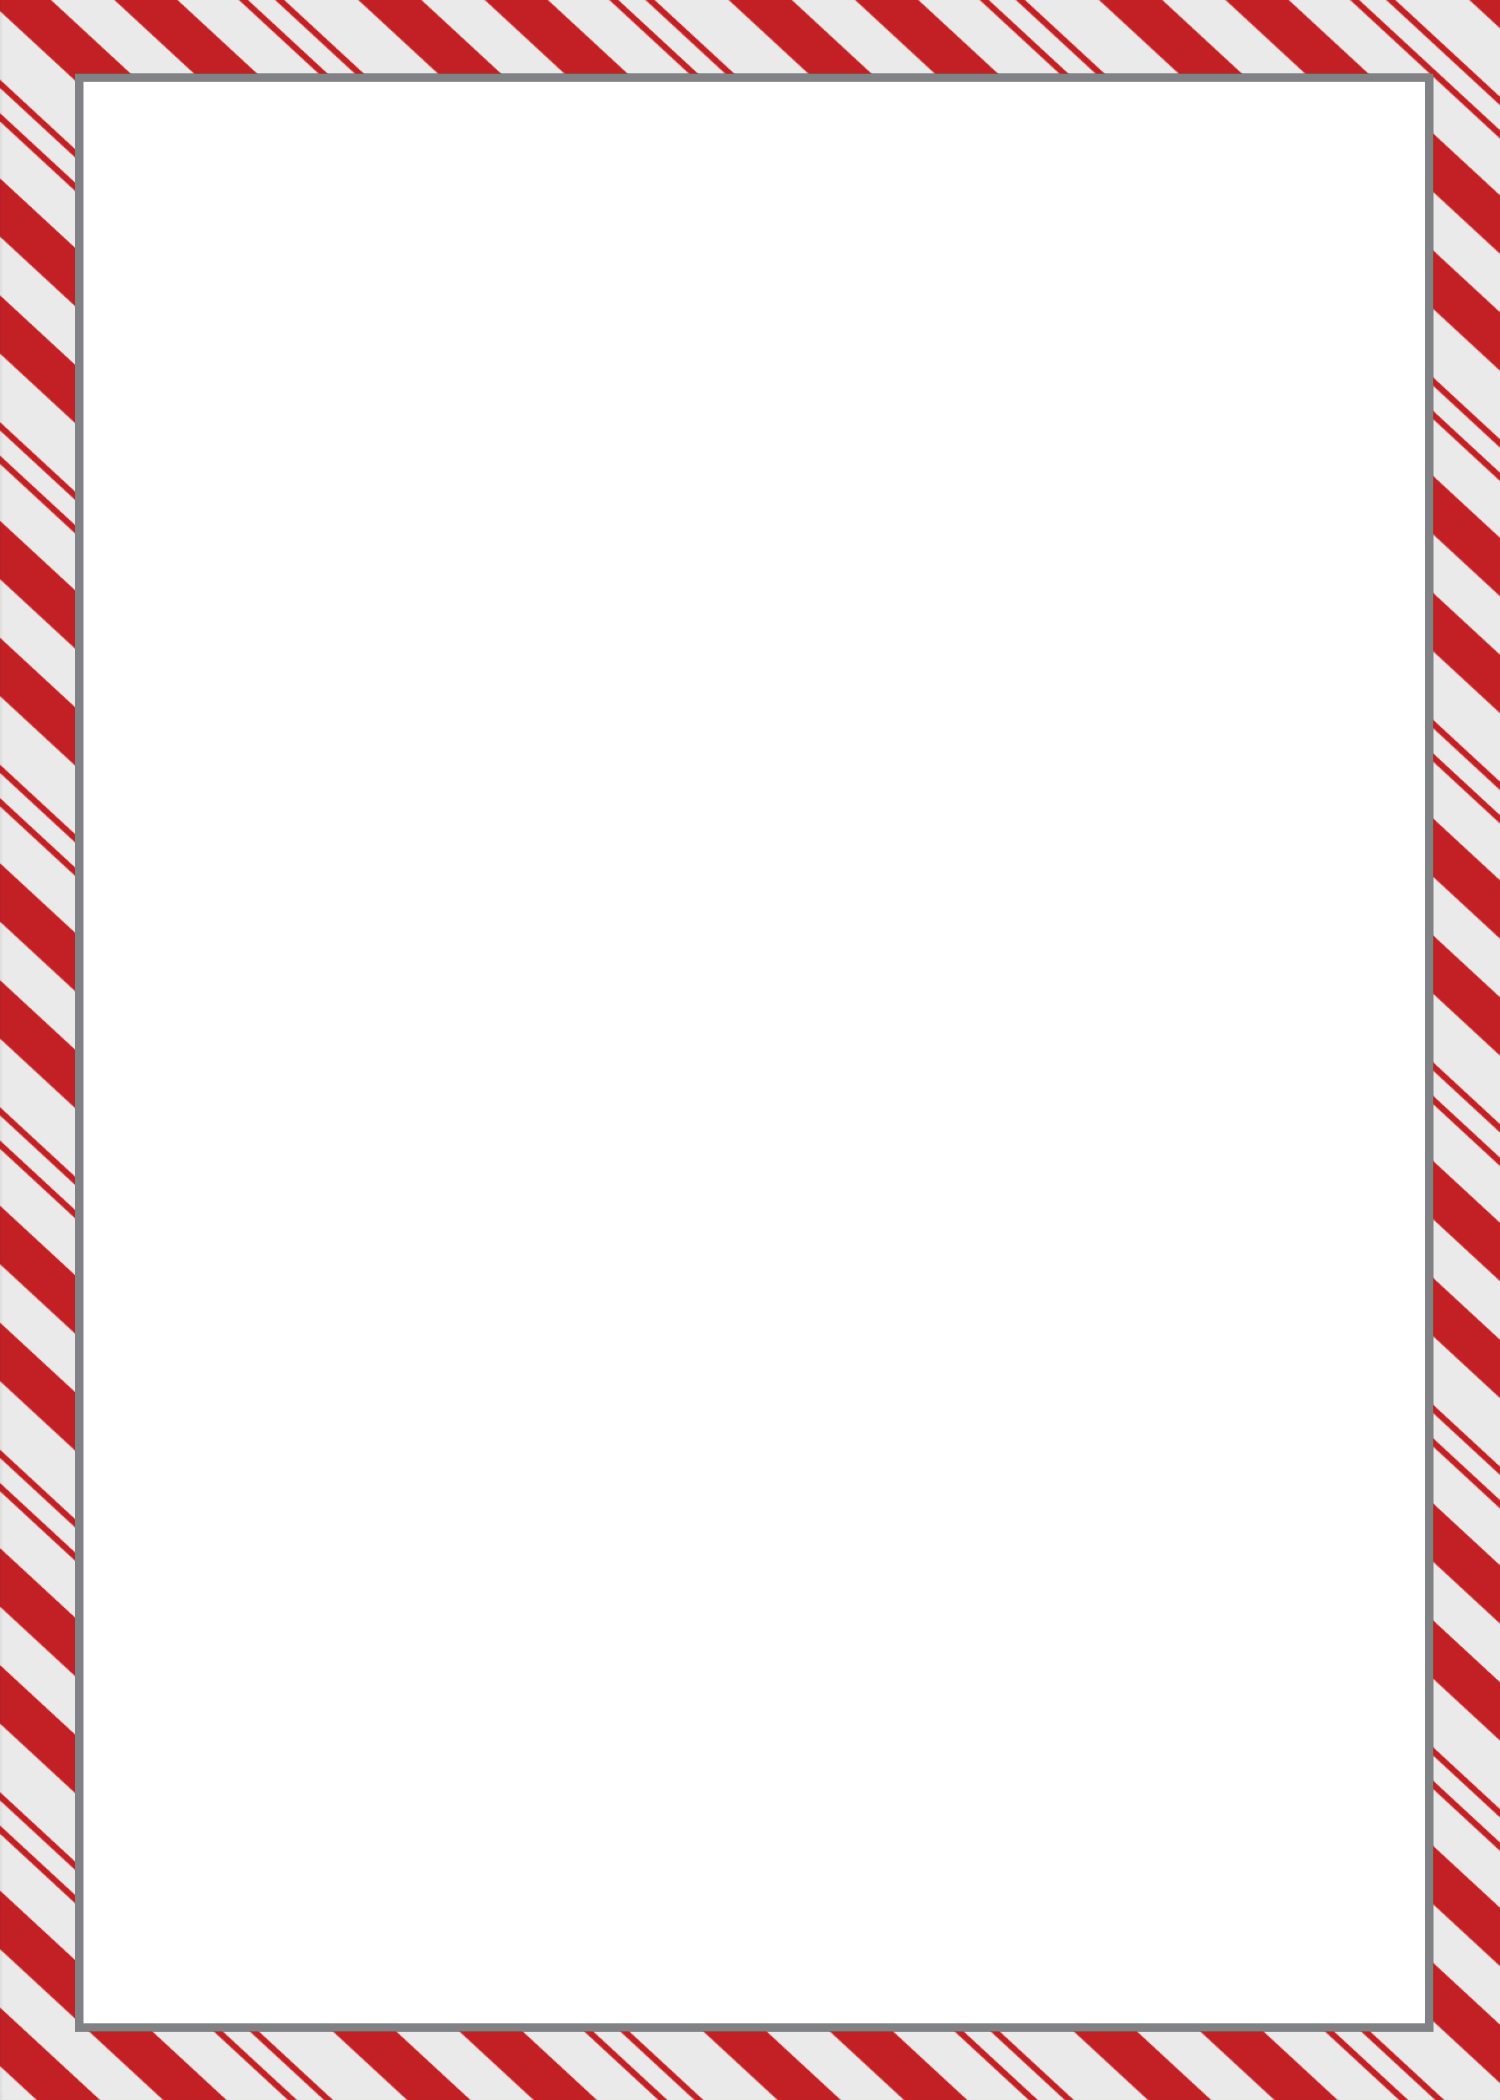 Frame clipart candy cane Border candy cane border x